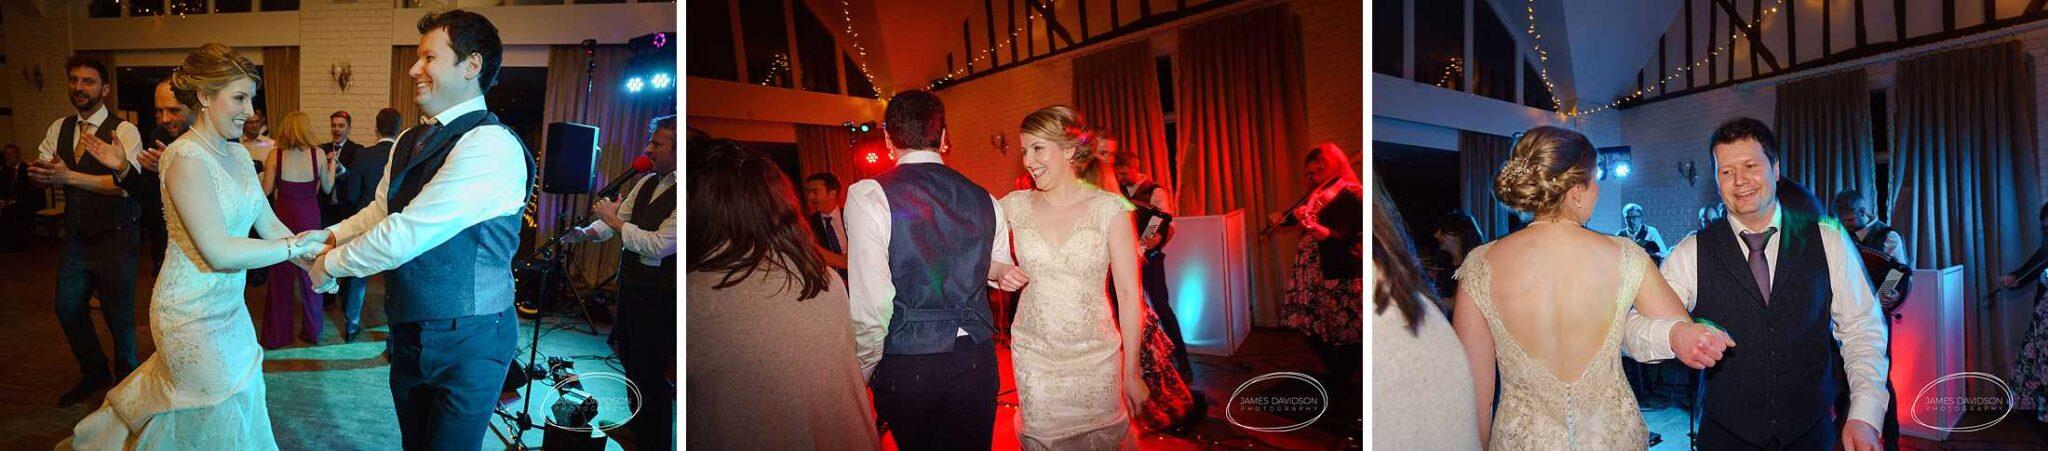 seckford-hall-wedding-096